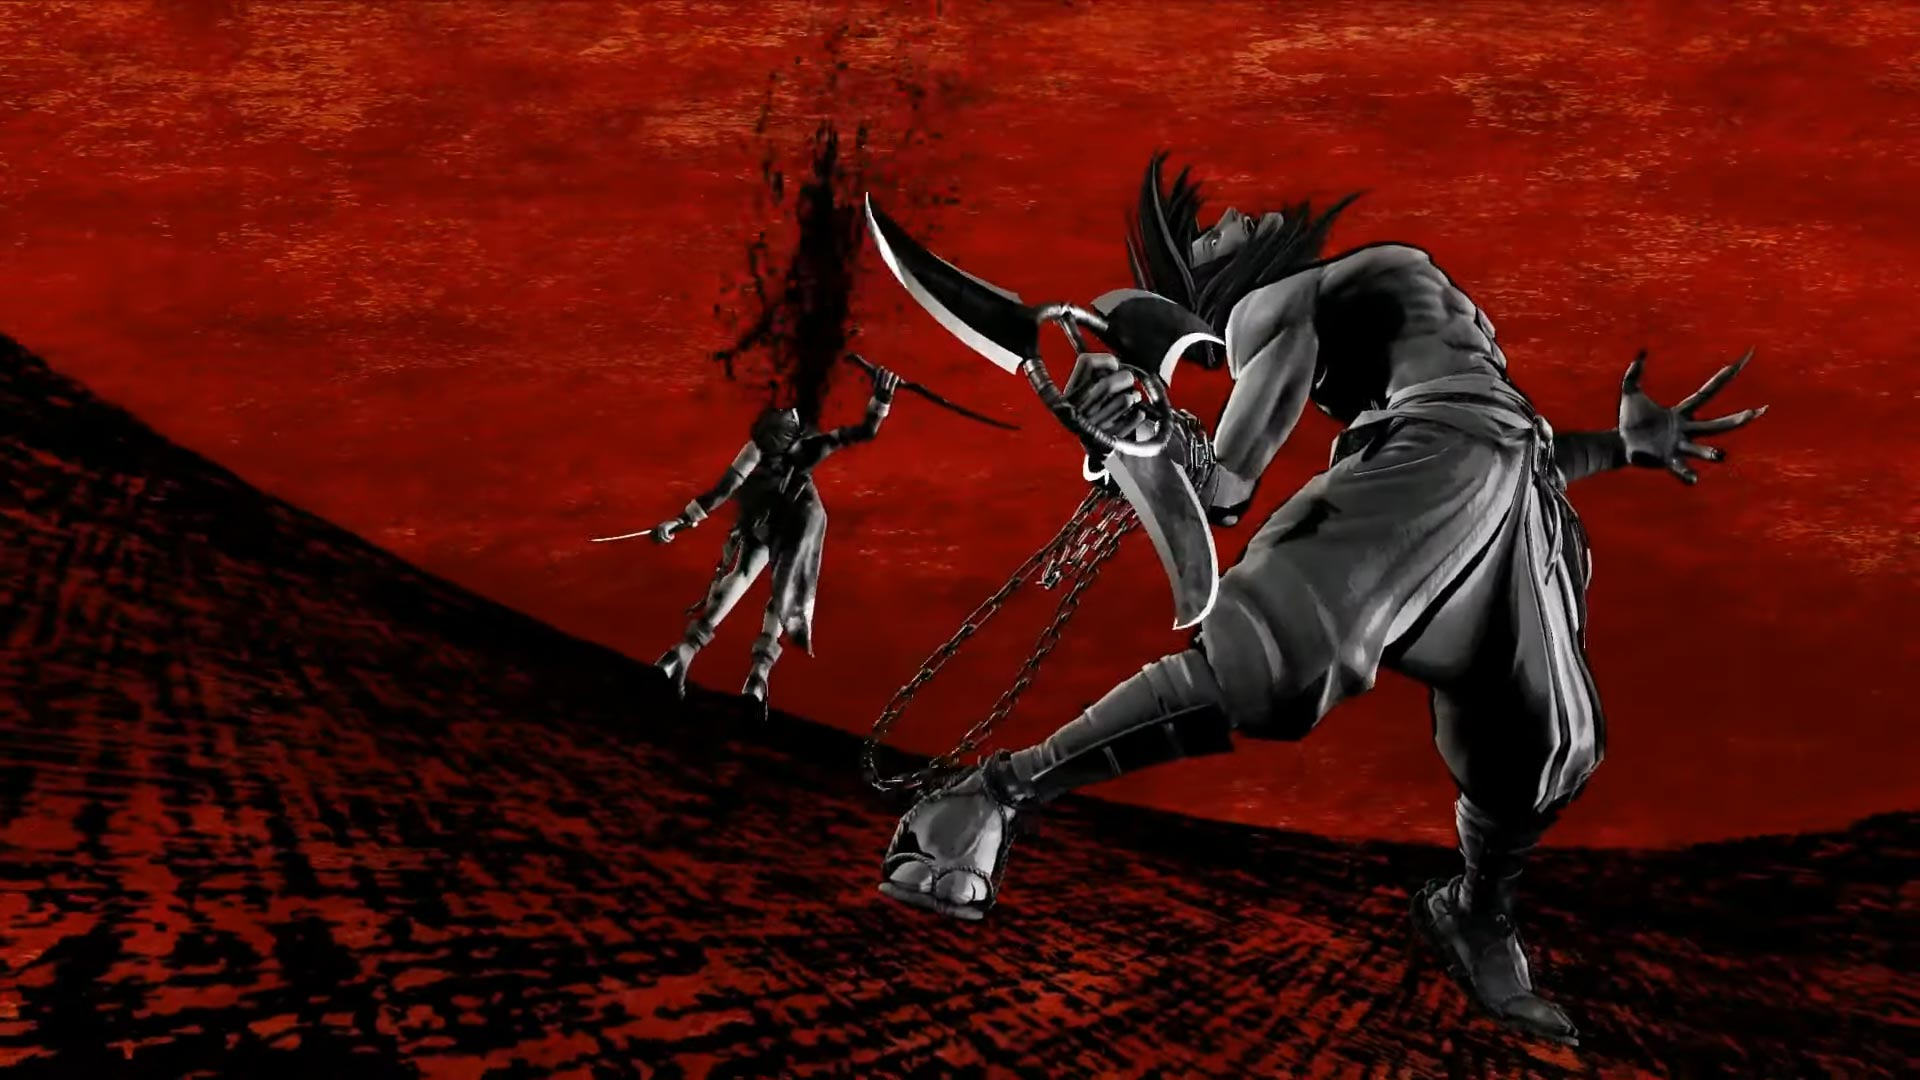 Samurai Shodown Basara Trailer Screenshots 3 out of 9 image gallery